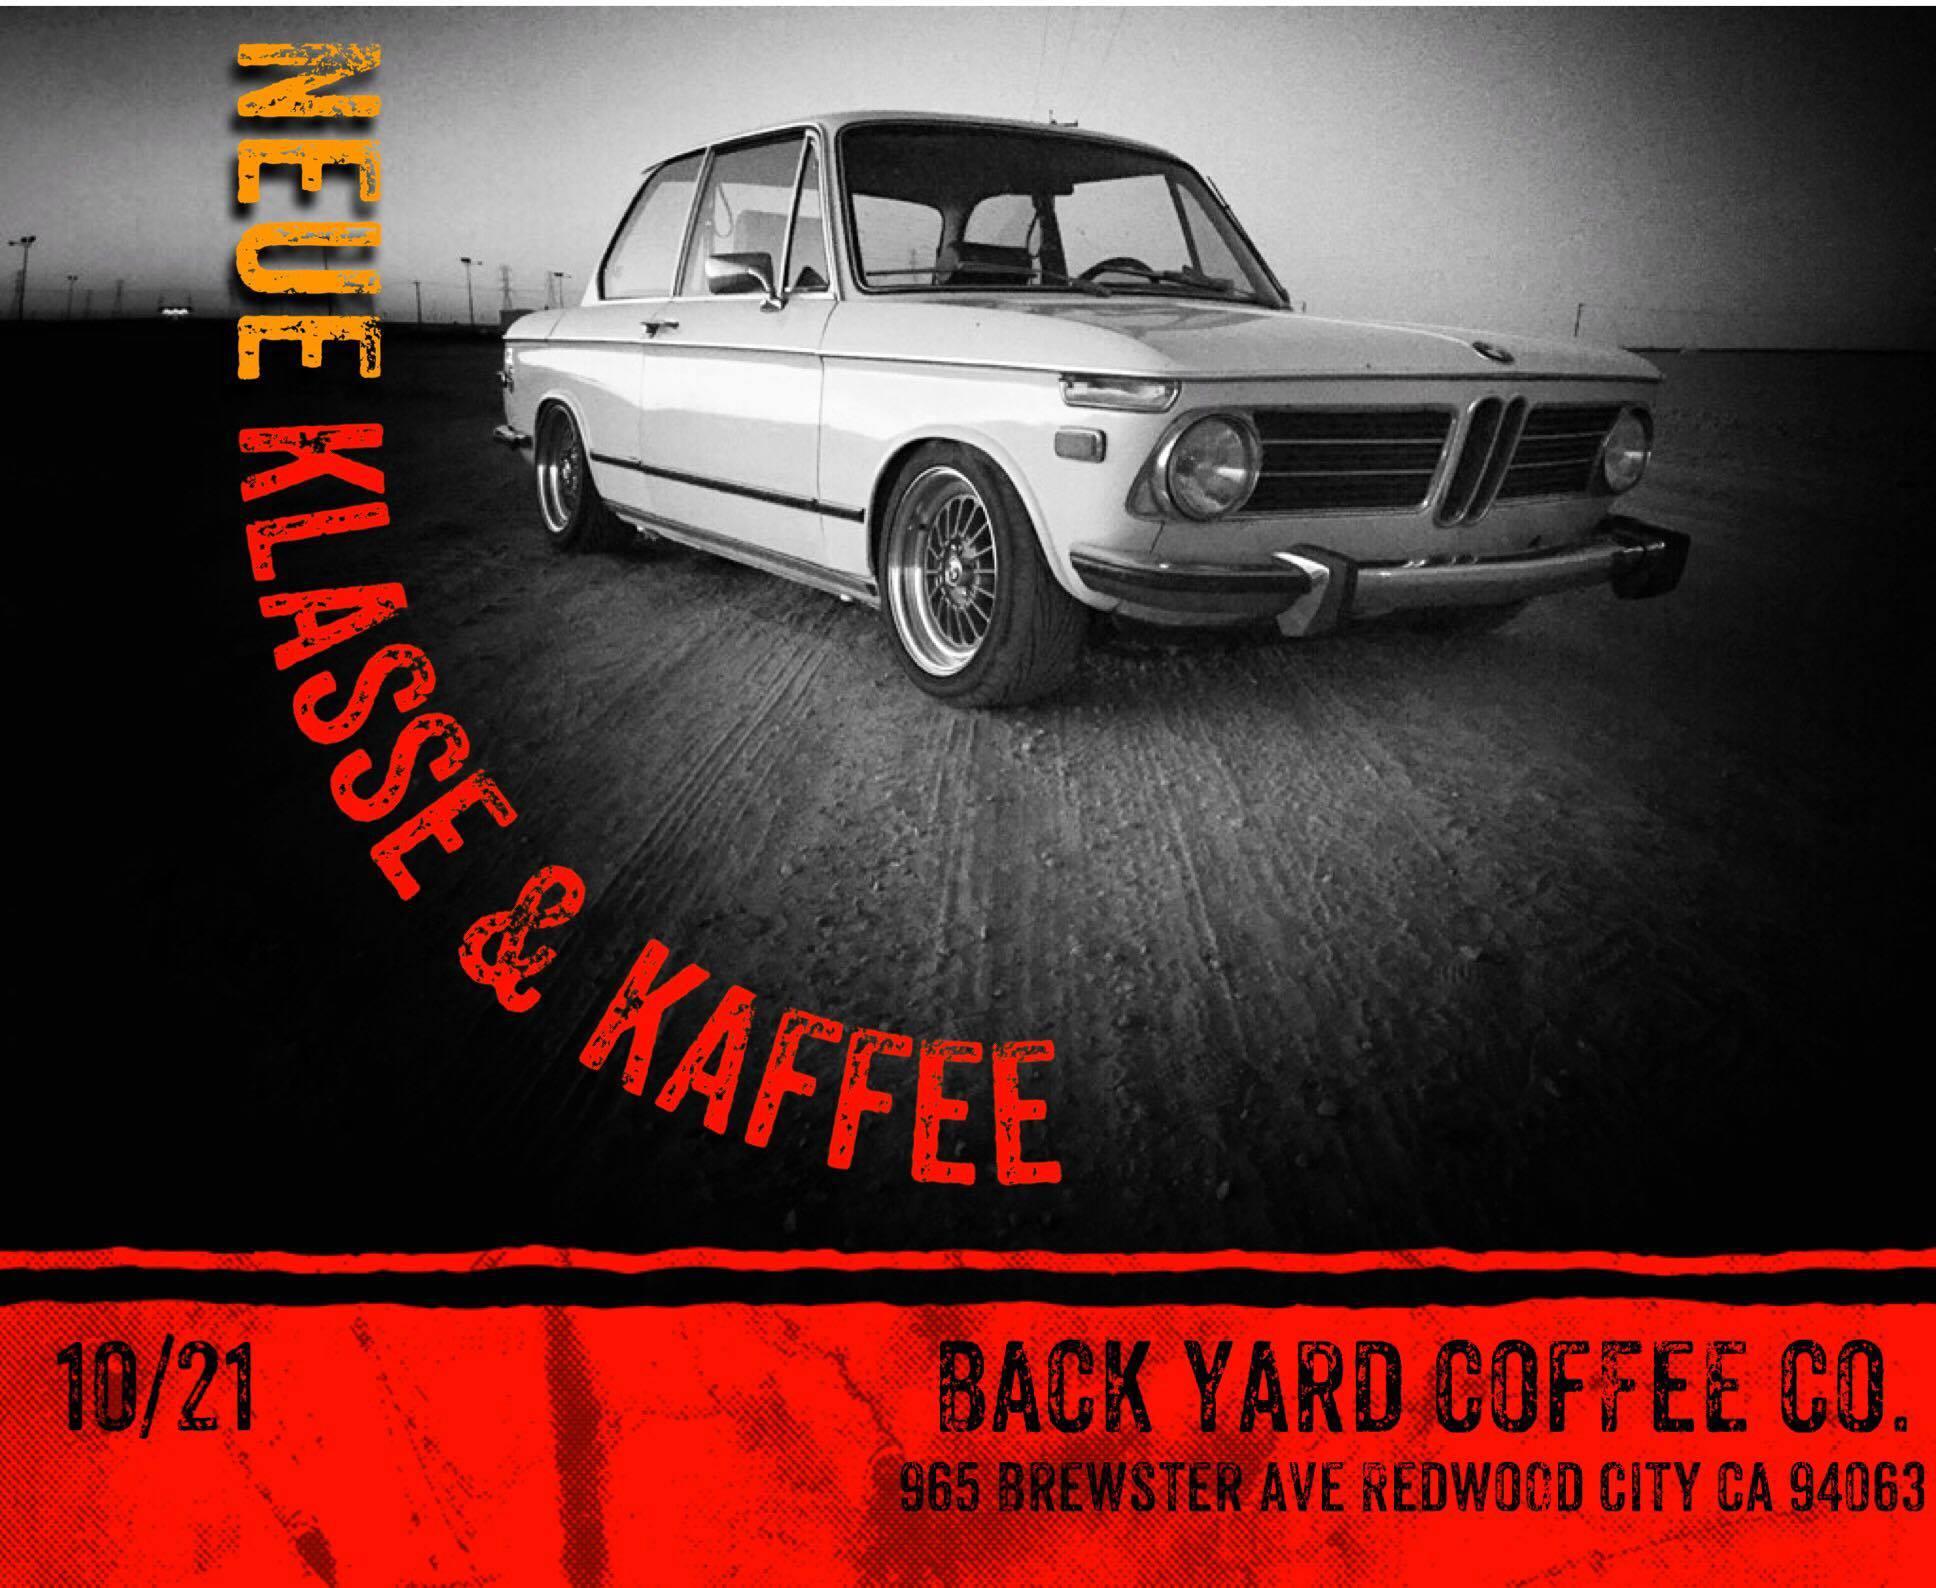 SF Bay Area Neue Klasse and Kaffee - Redwood City - 10/21 ...